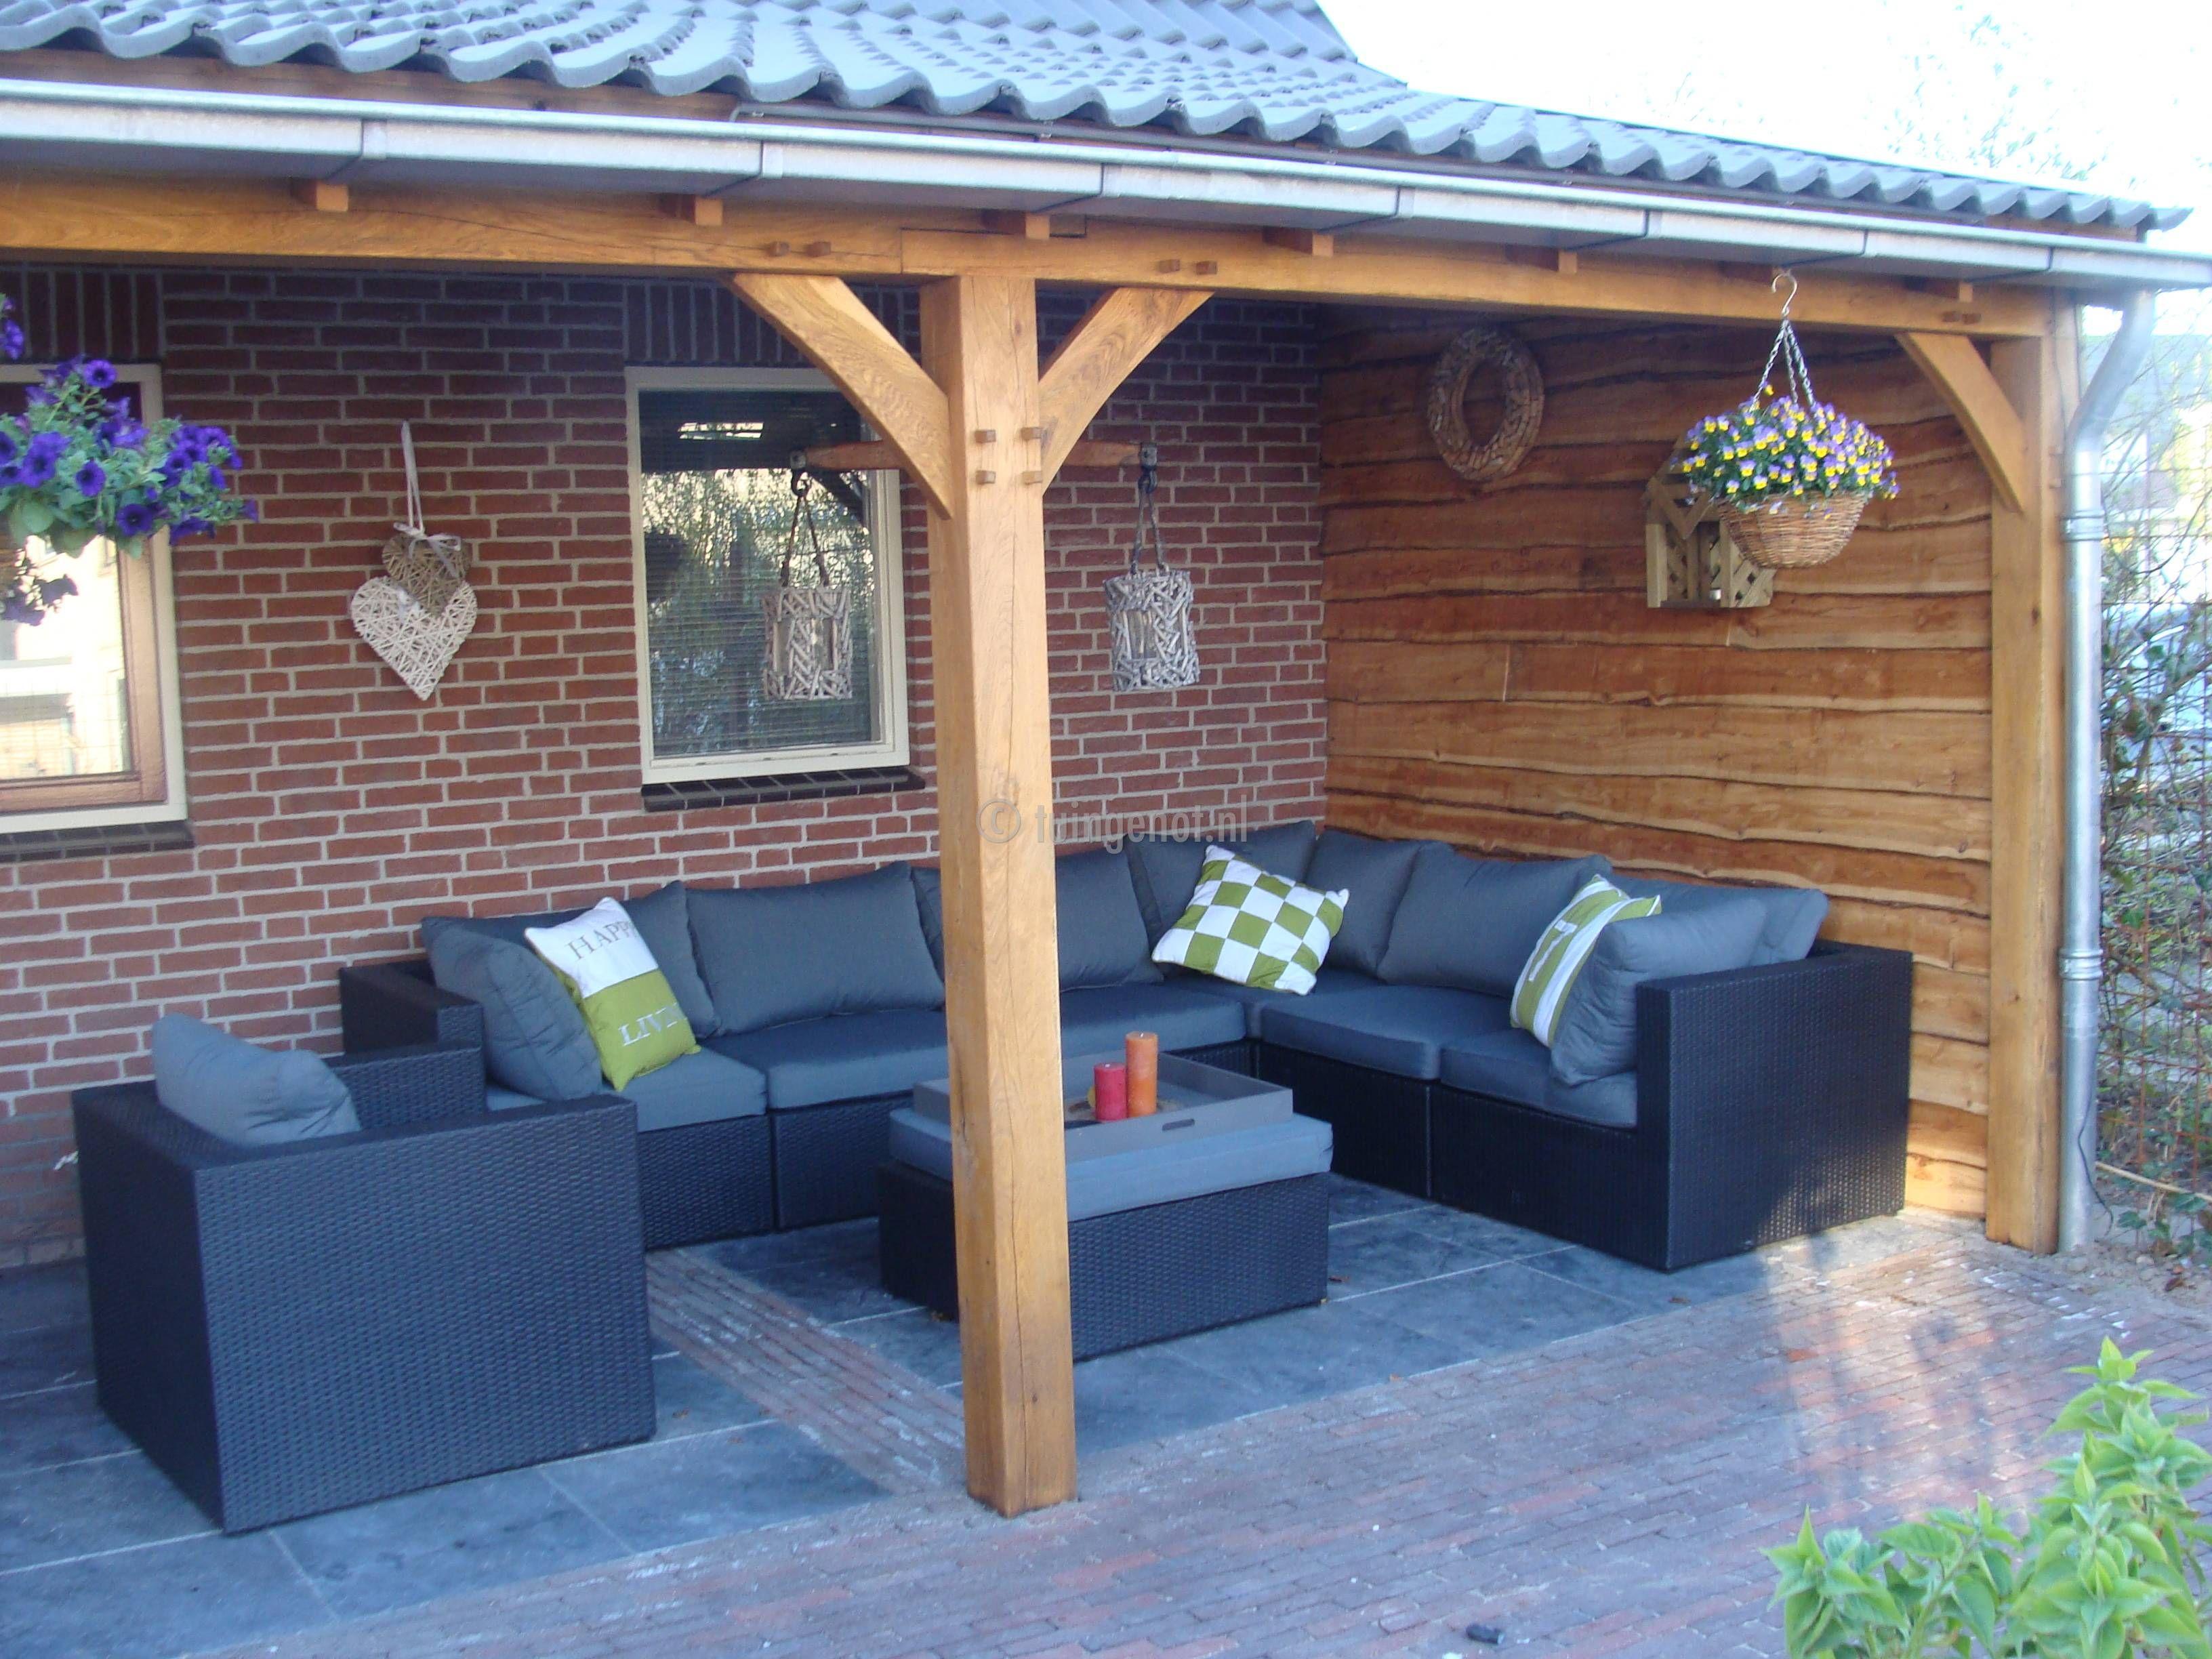 50 lariks schaaldelen houten veranda afdak gezellig for Houten veranda